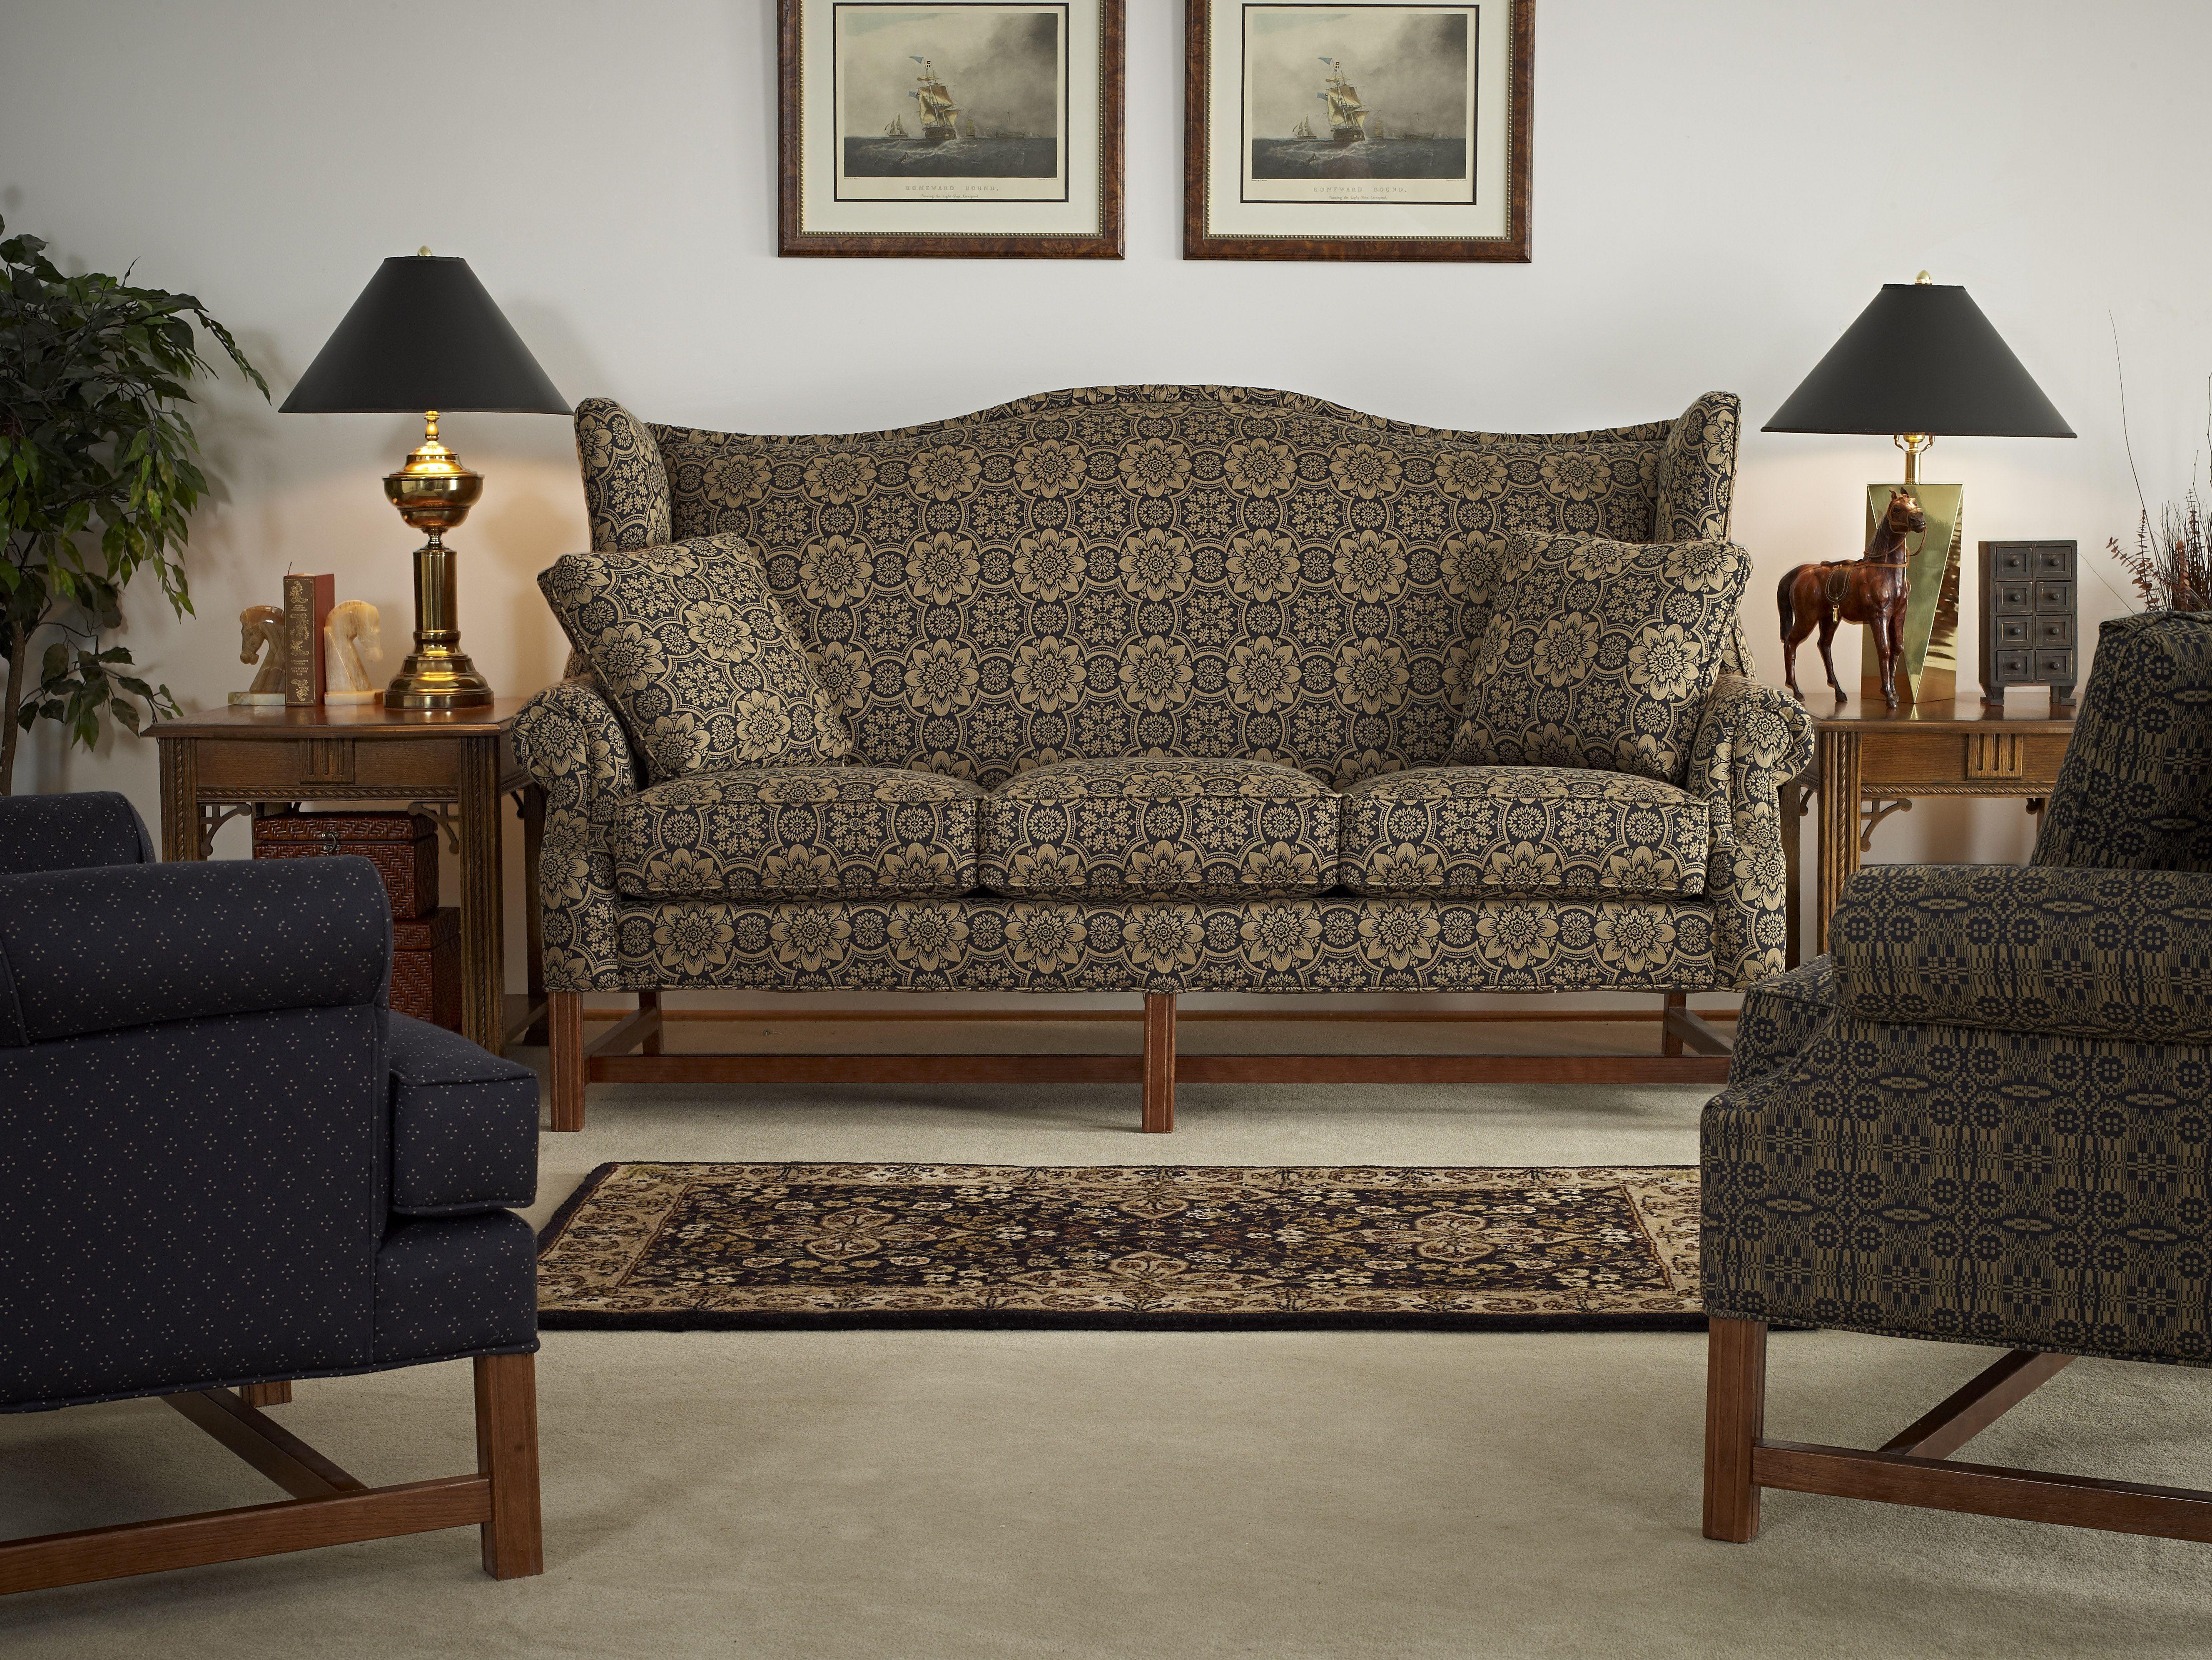 Pin by Lancer Furniture on Homespun Collection | Primitive ...